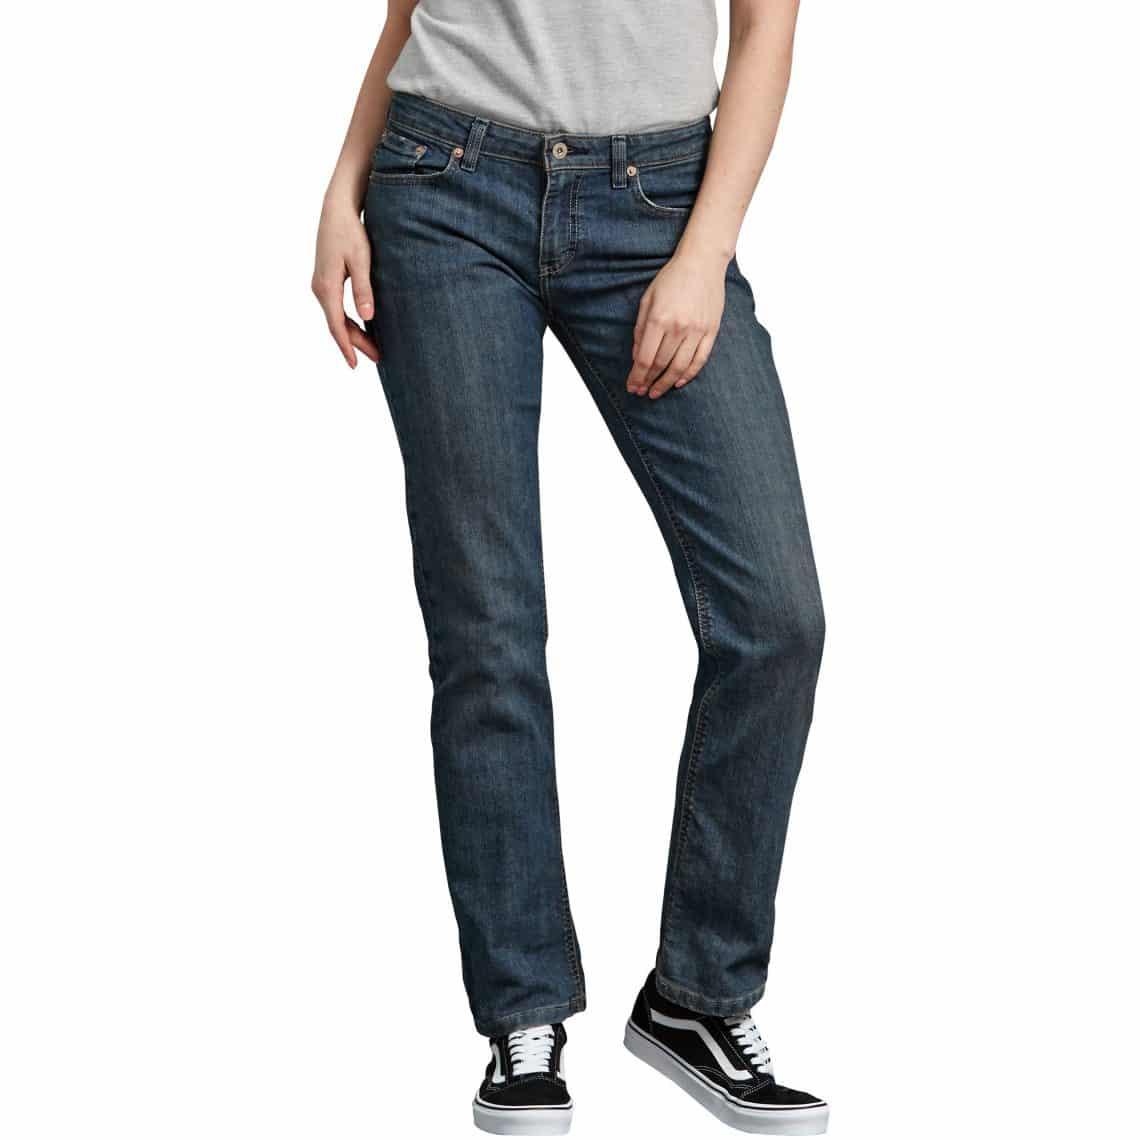 7365a9b40 DICKIES WOMEN S RELAXED STRAIGHT LEG DENIM JEANS - ANTIQUE DARK BLUE ...